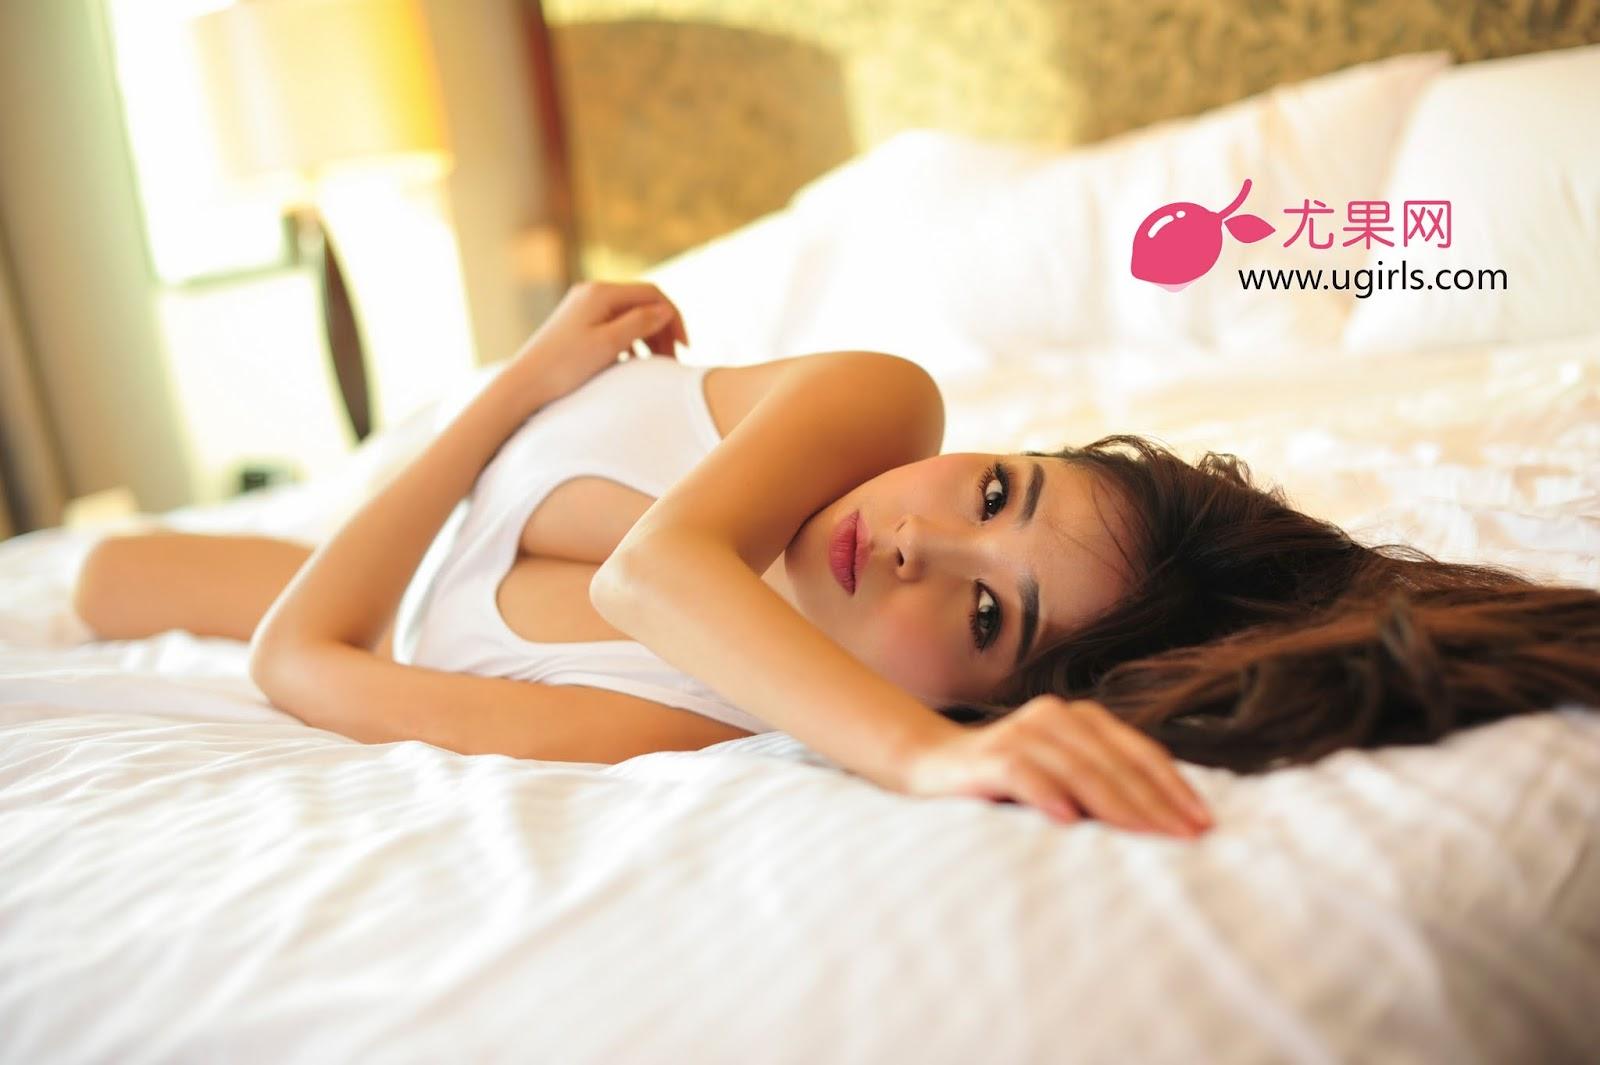 DLS 4849 - Hot Girl Model UGIRLS NO.13